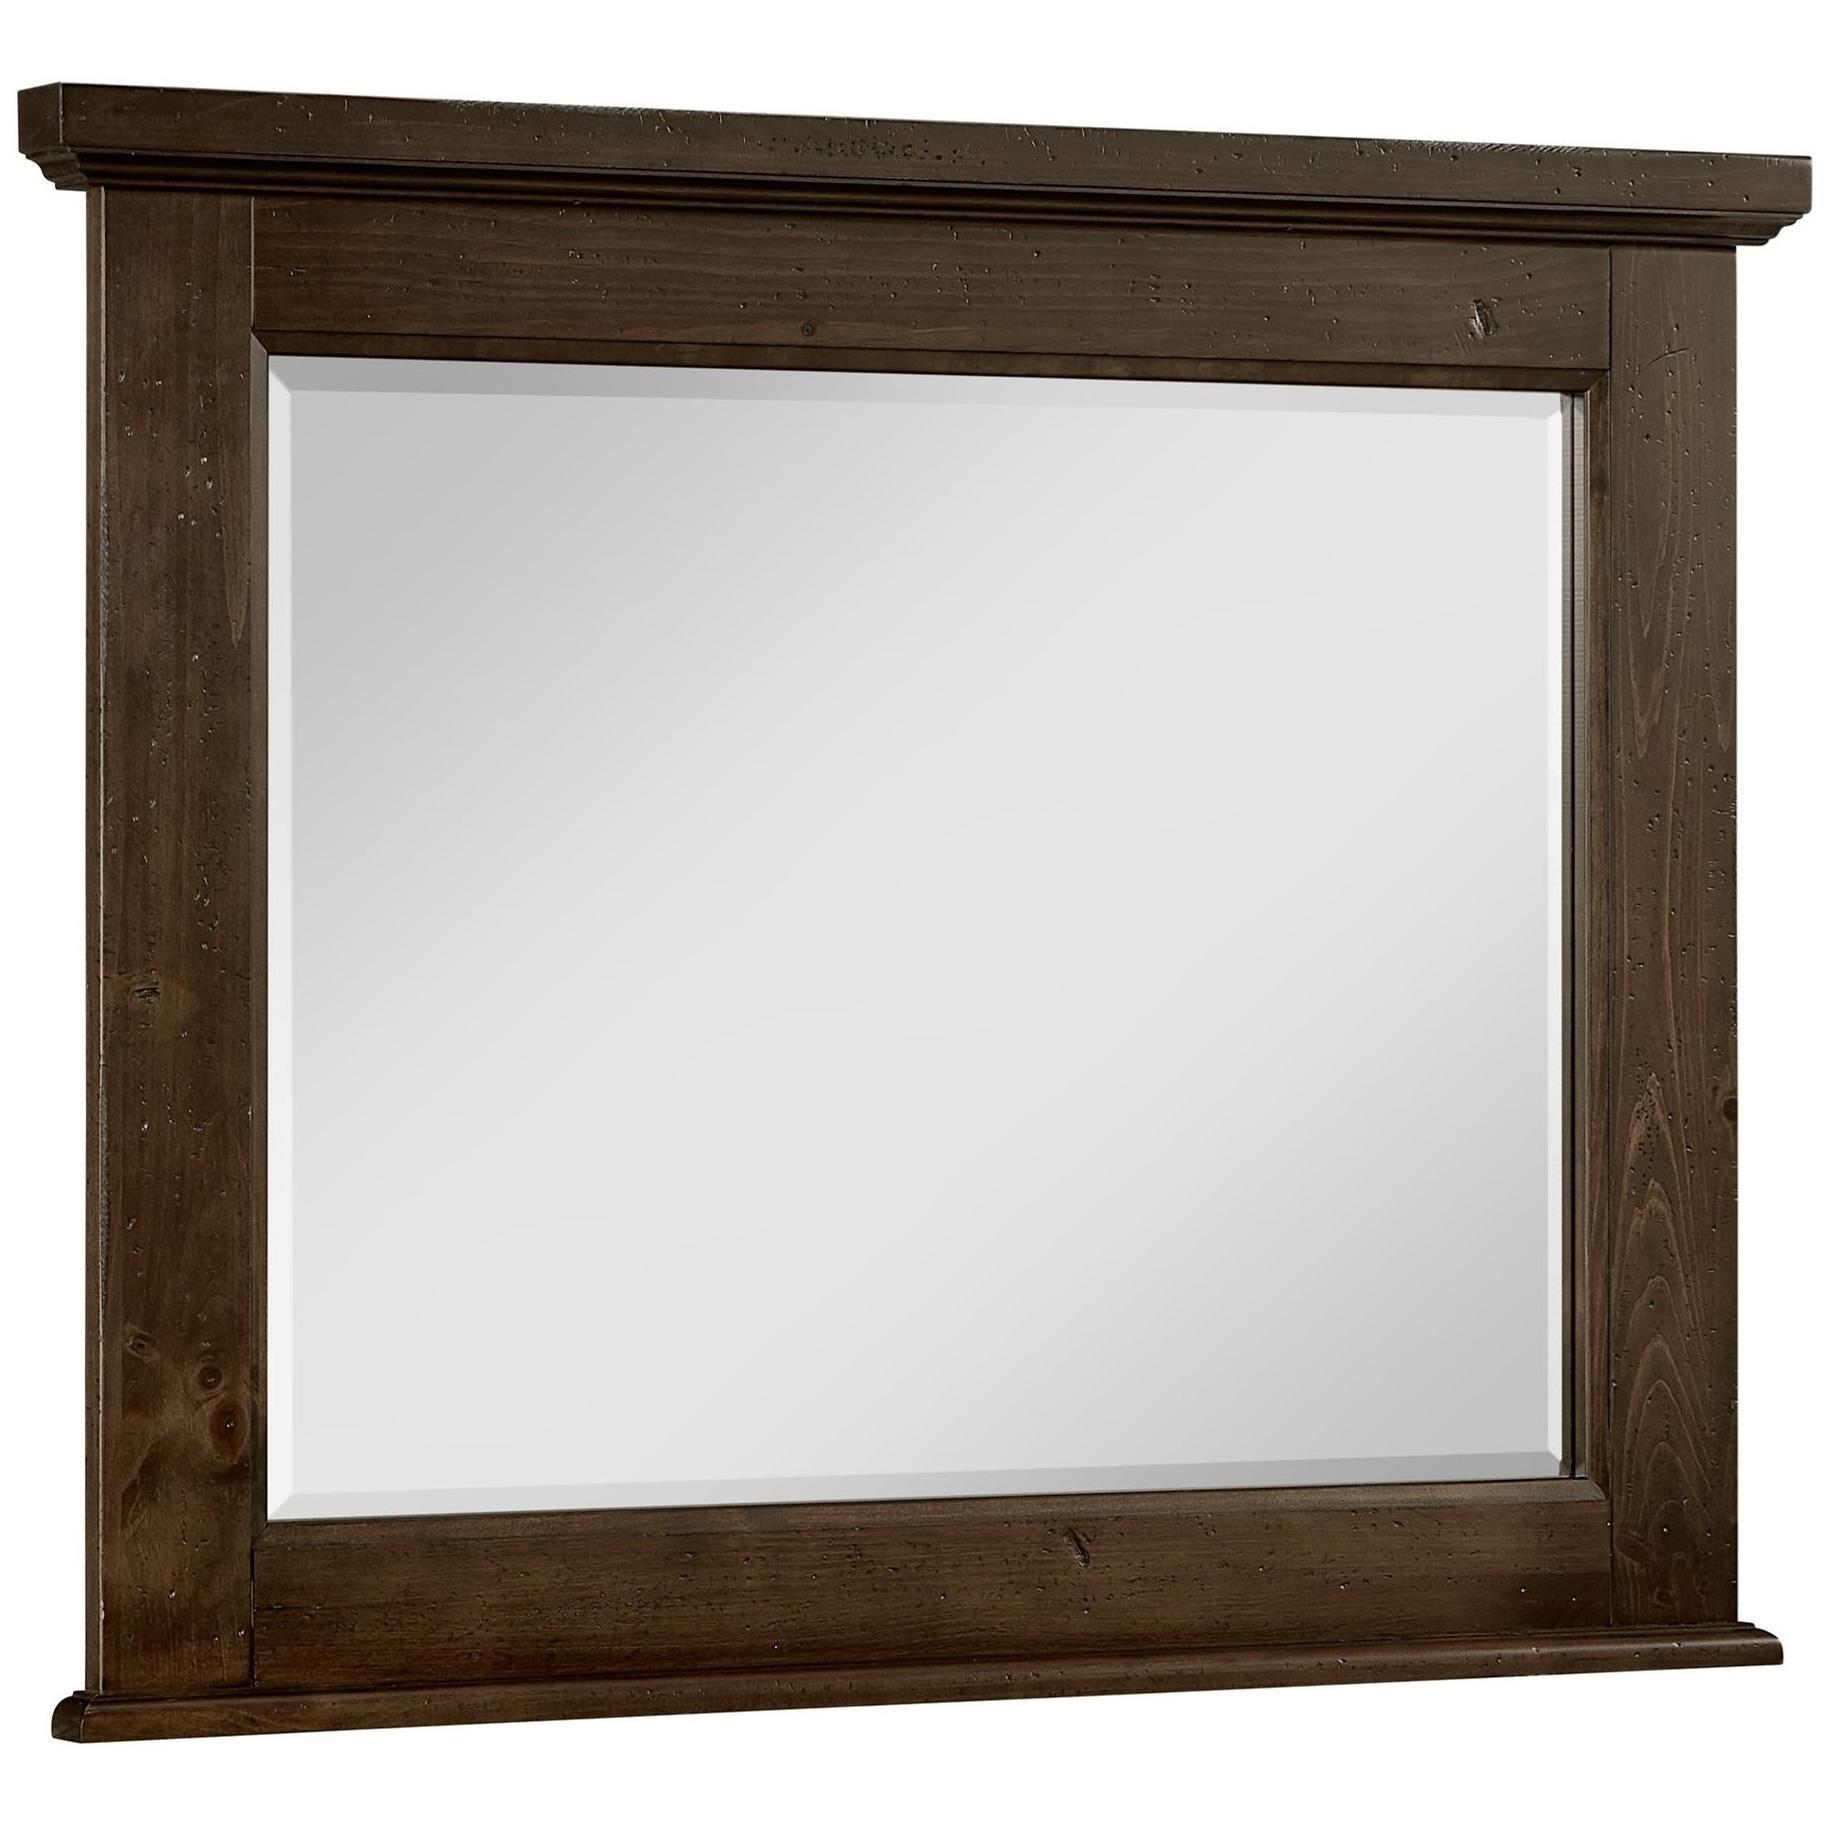 Home Bedroom Furniture Dresser Mirrors Vaughan Bassett Sawmill Dresser  Mirror. Vaughan Bassett SawmillDresser Mirror ...